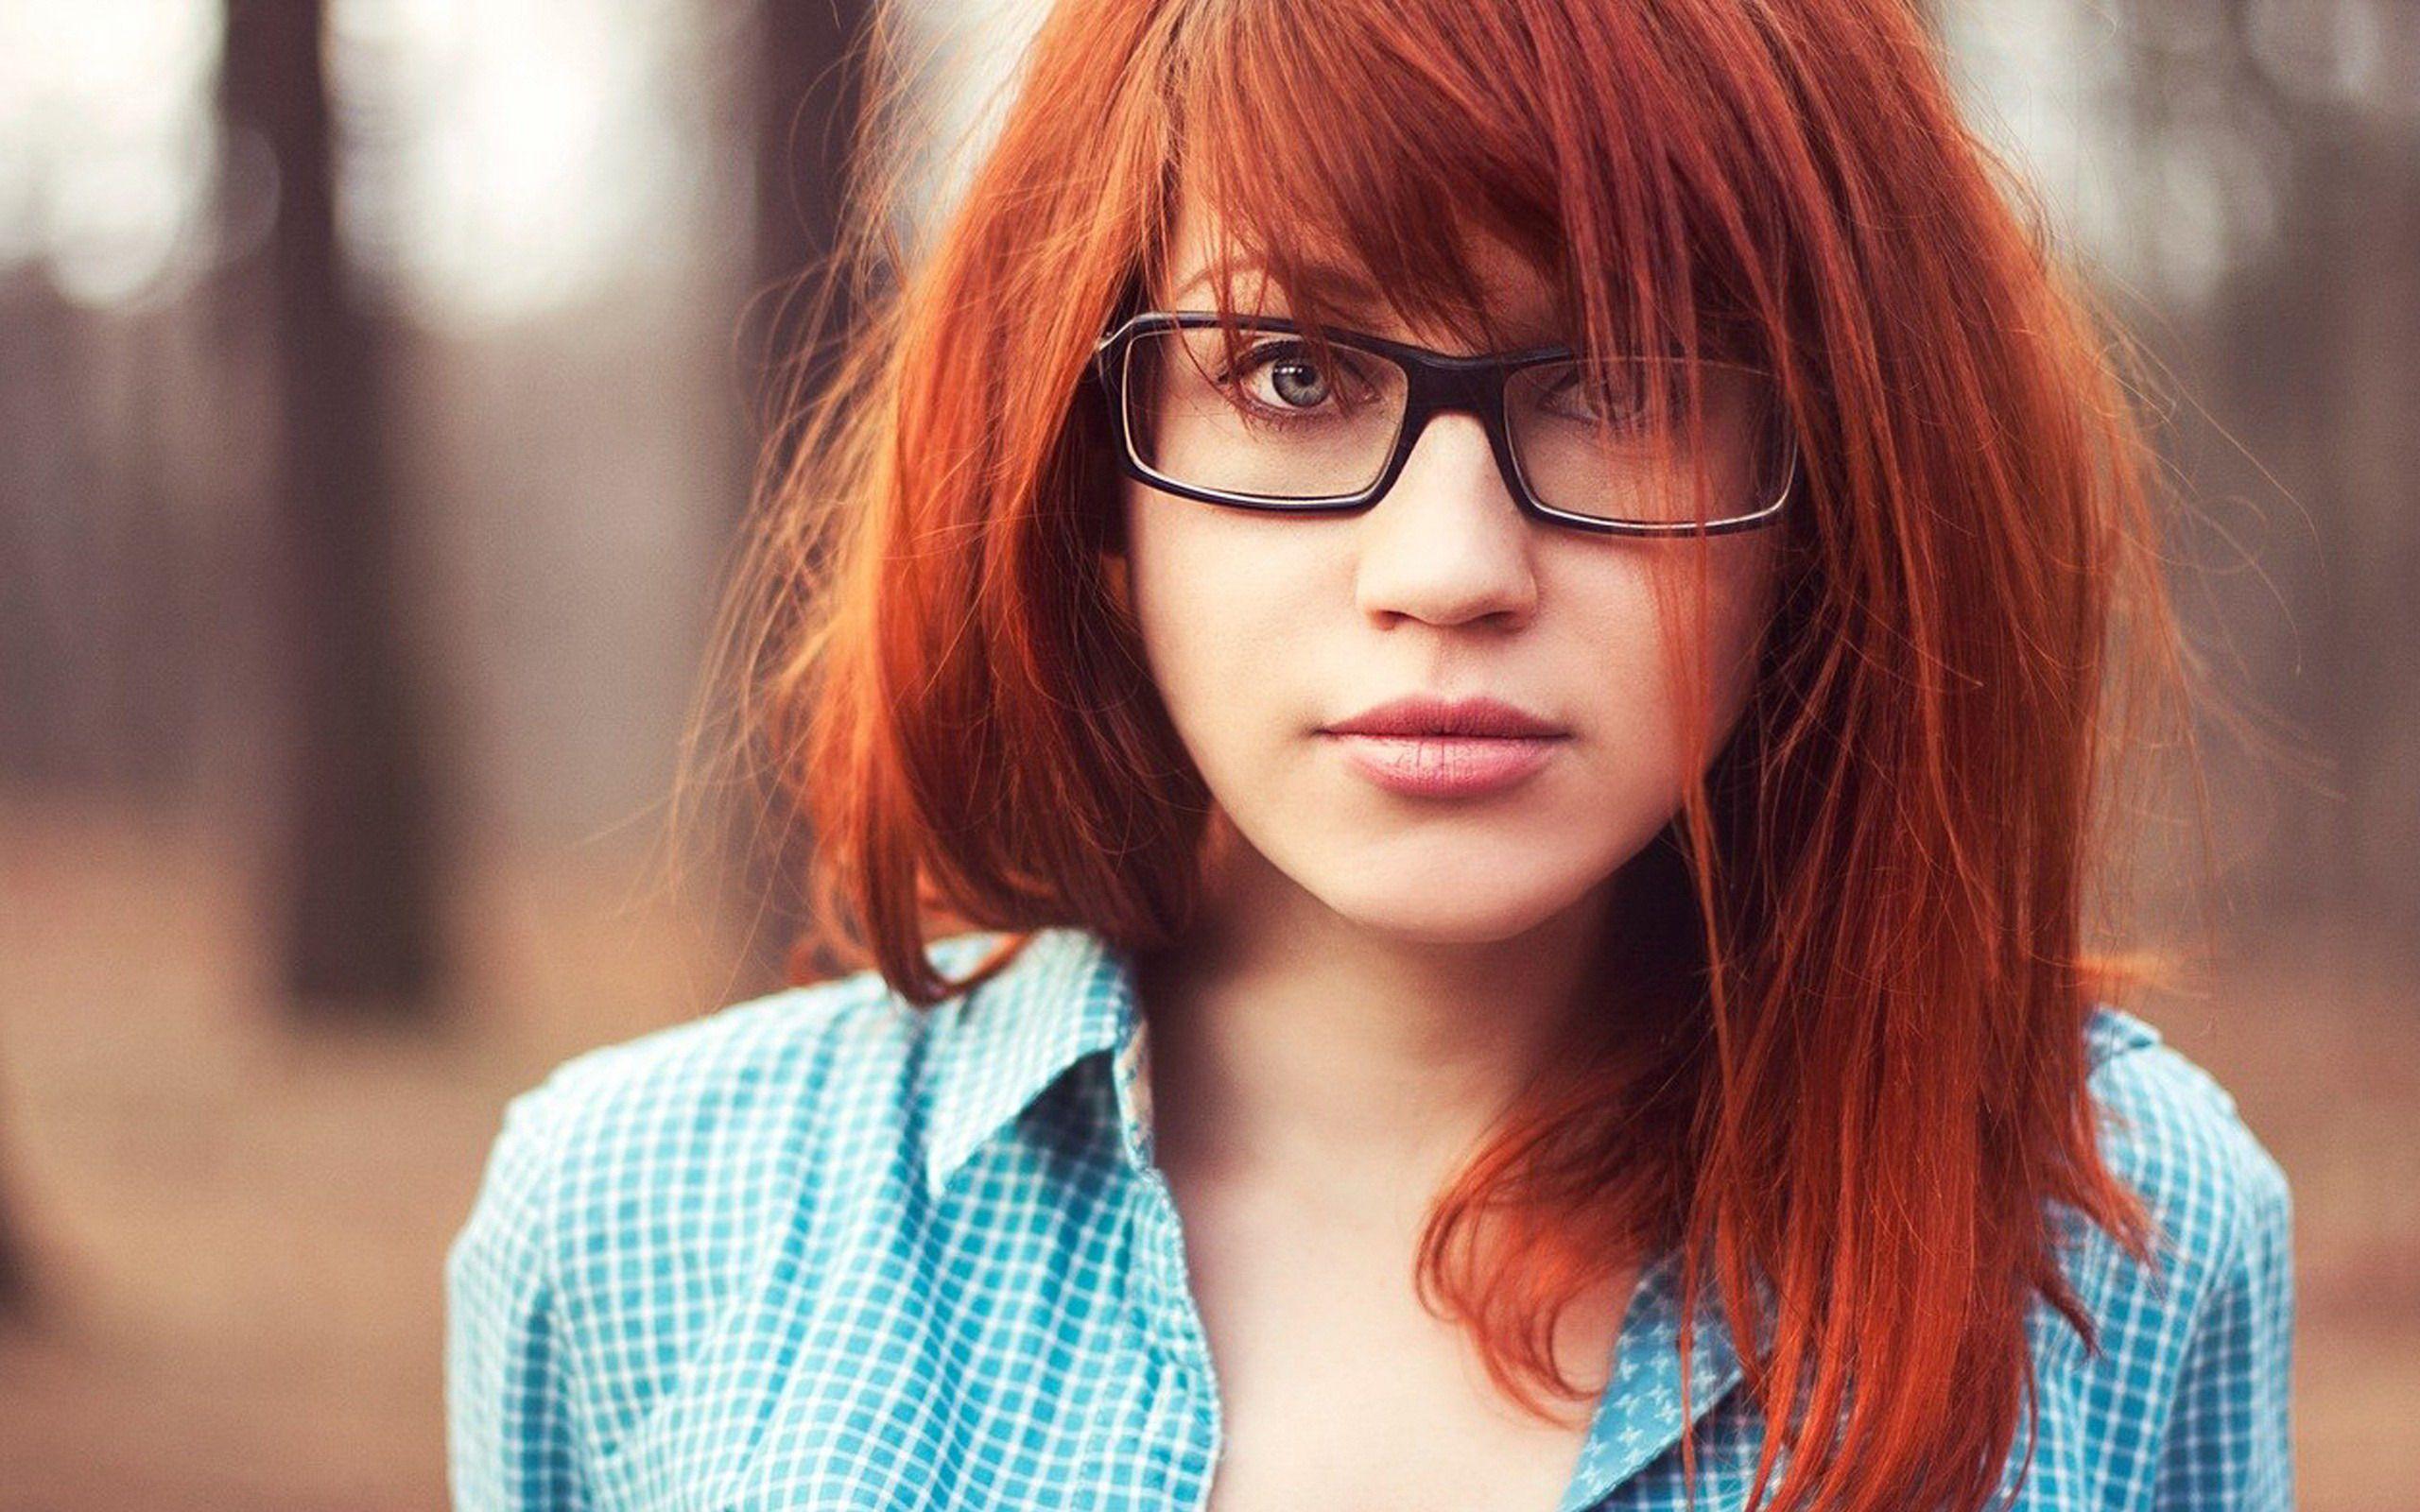 Women Redheads Glasses Face Wallpaperg